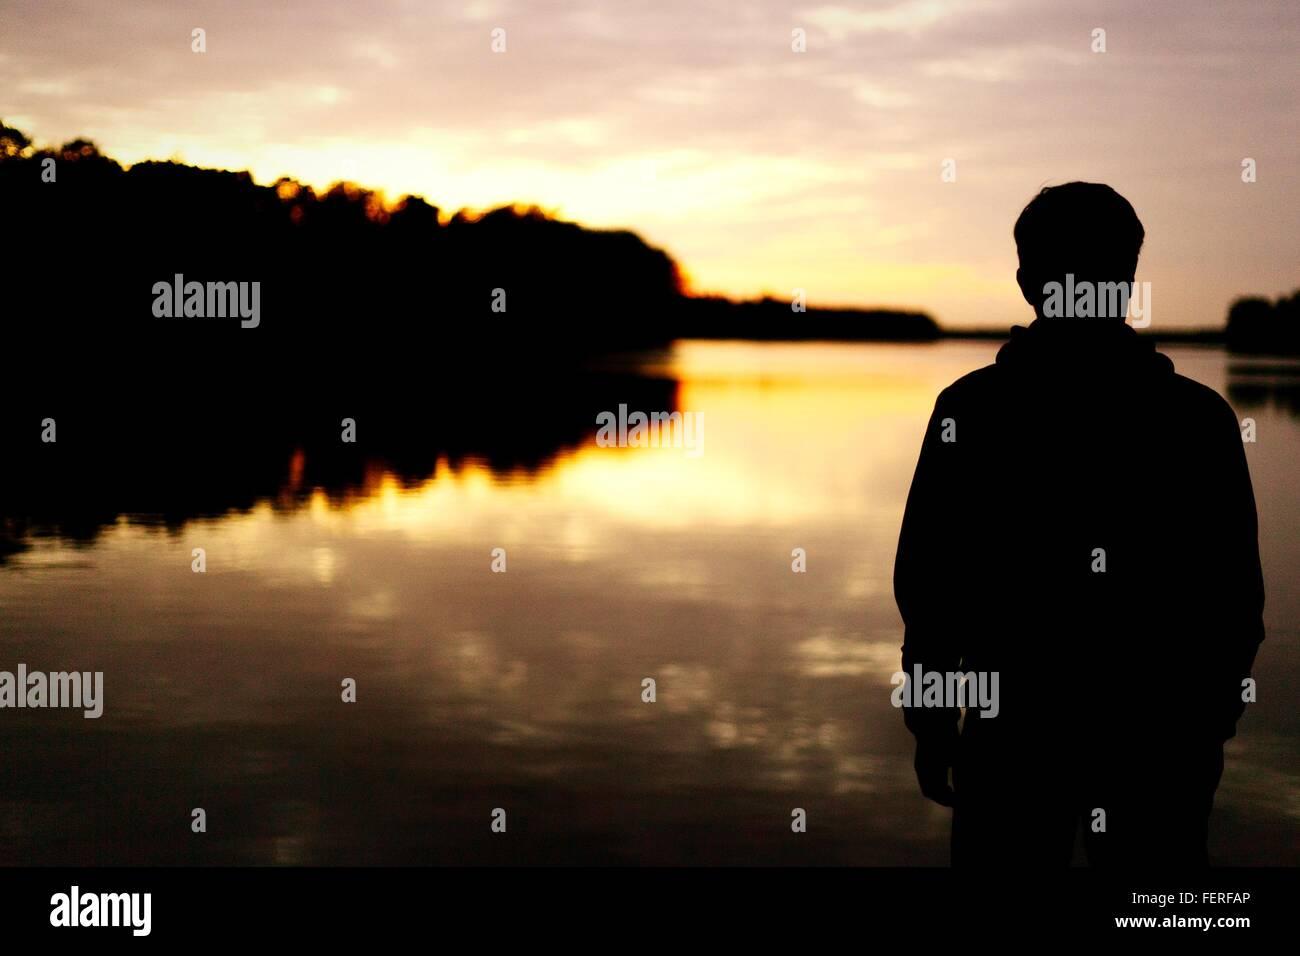 Rückansicht des Silhouette Mann stand vor See bei Sonnenuntergang Stockbild